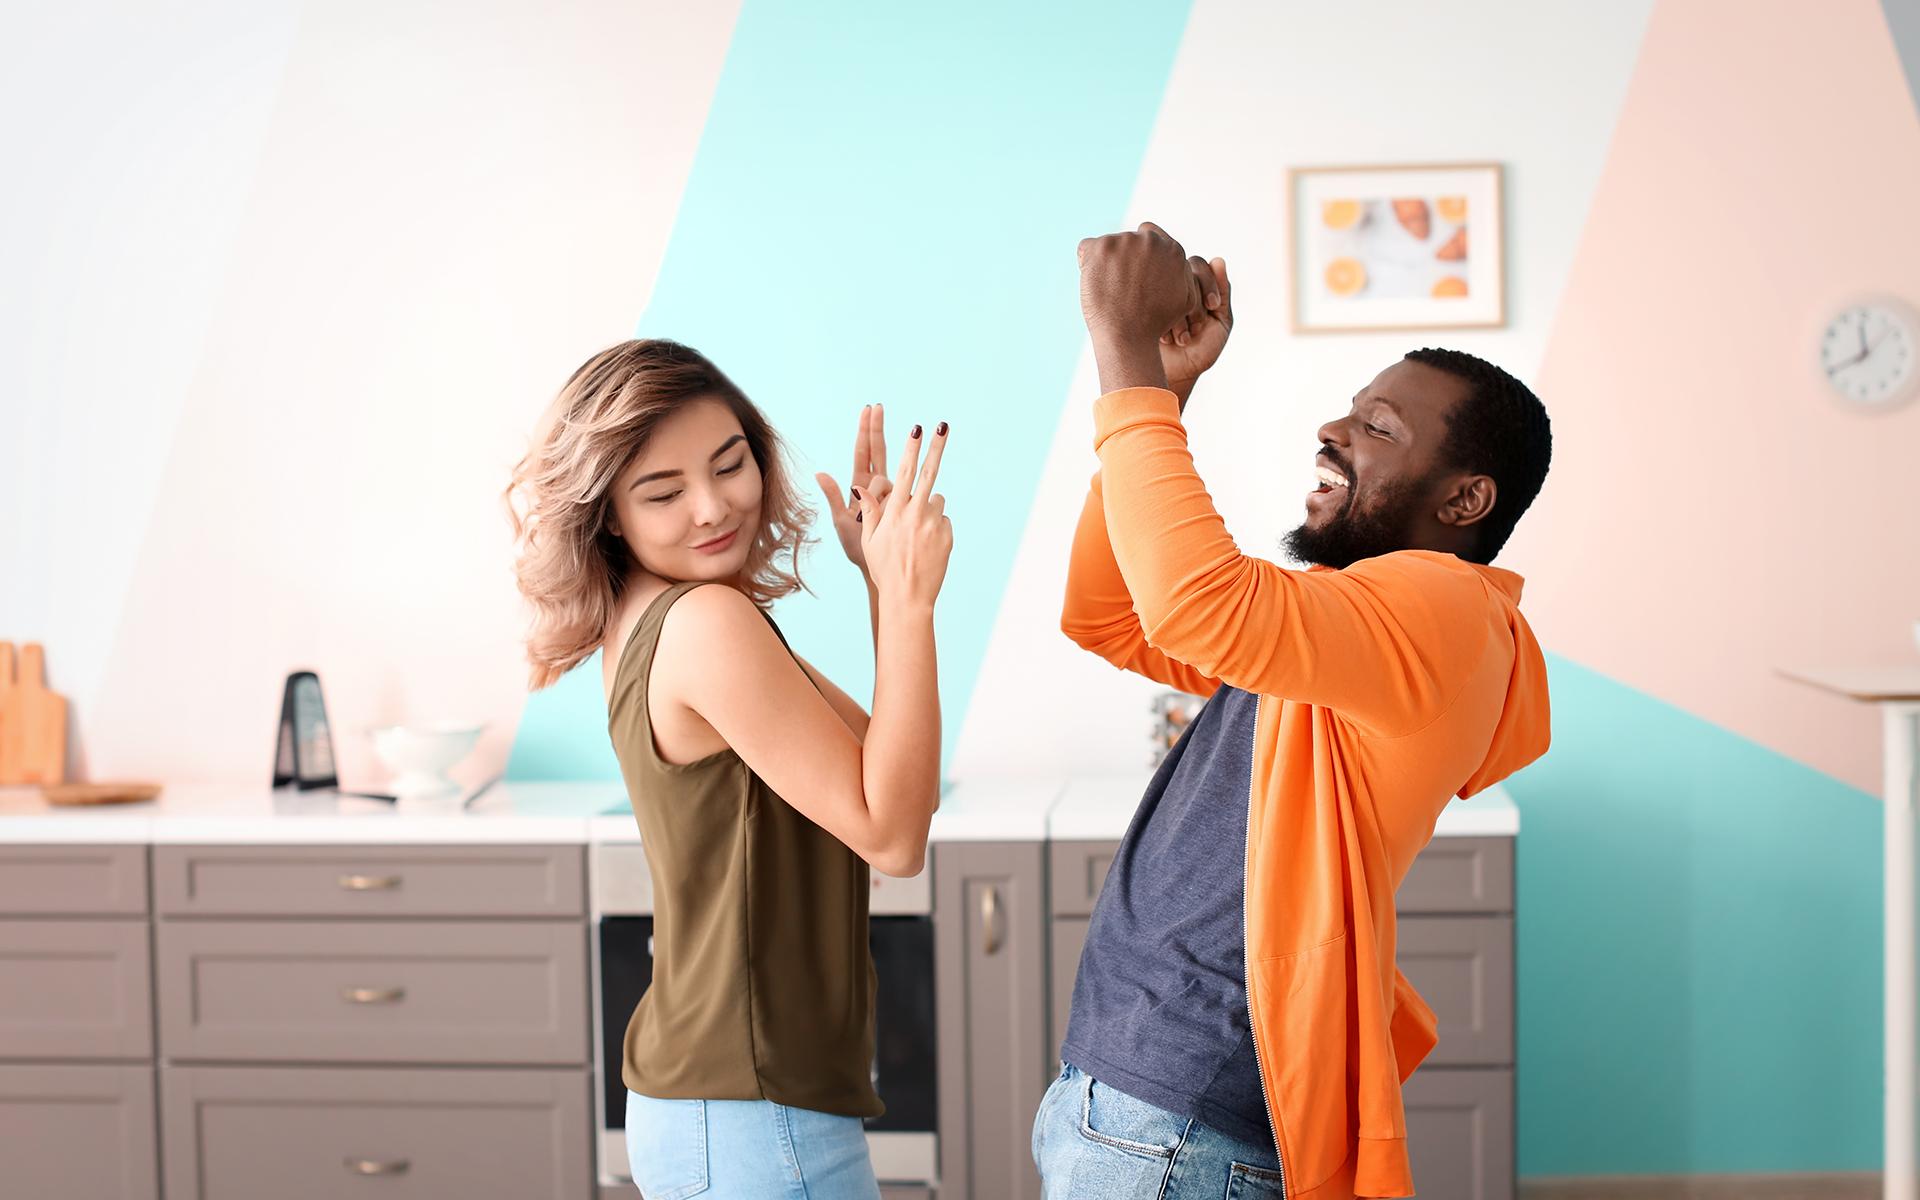 Cute interracial couple dancing at home